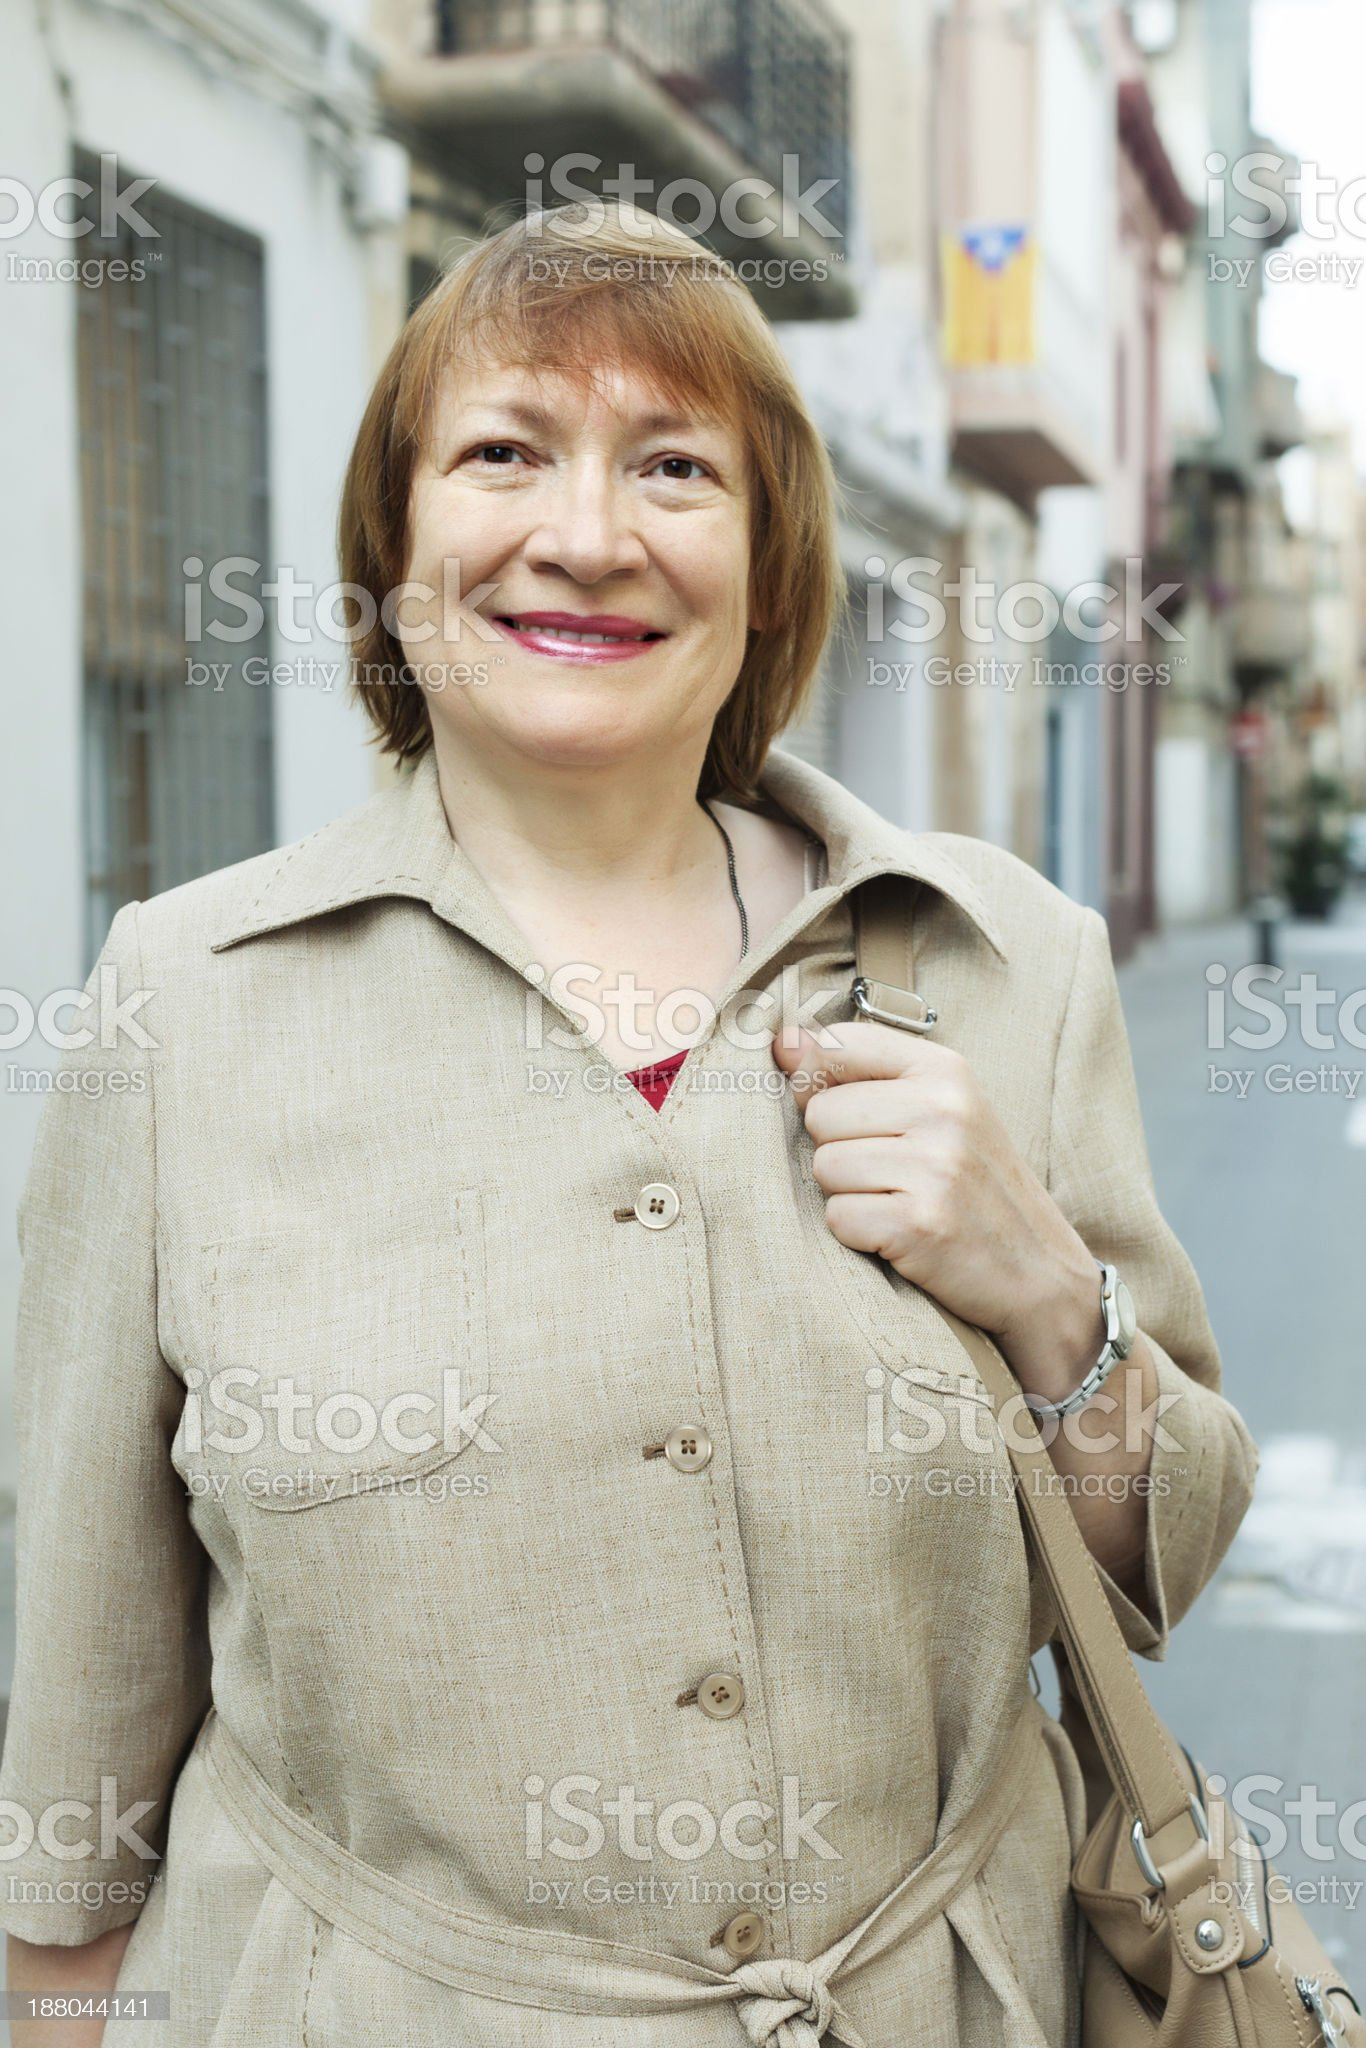 positive senior woman at european city street royalty-free stock photo